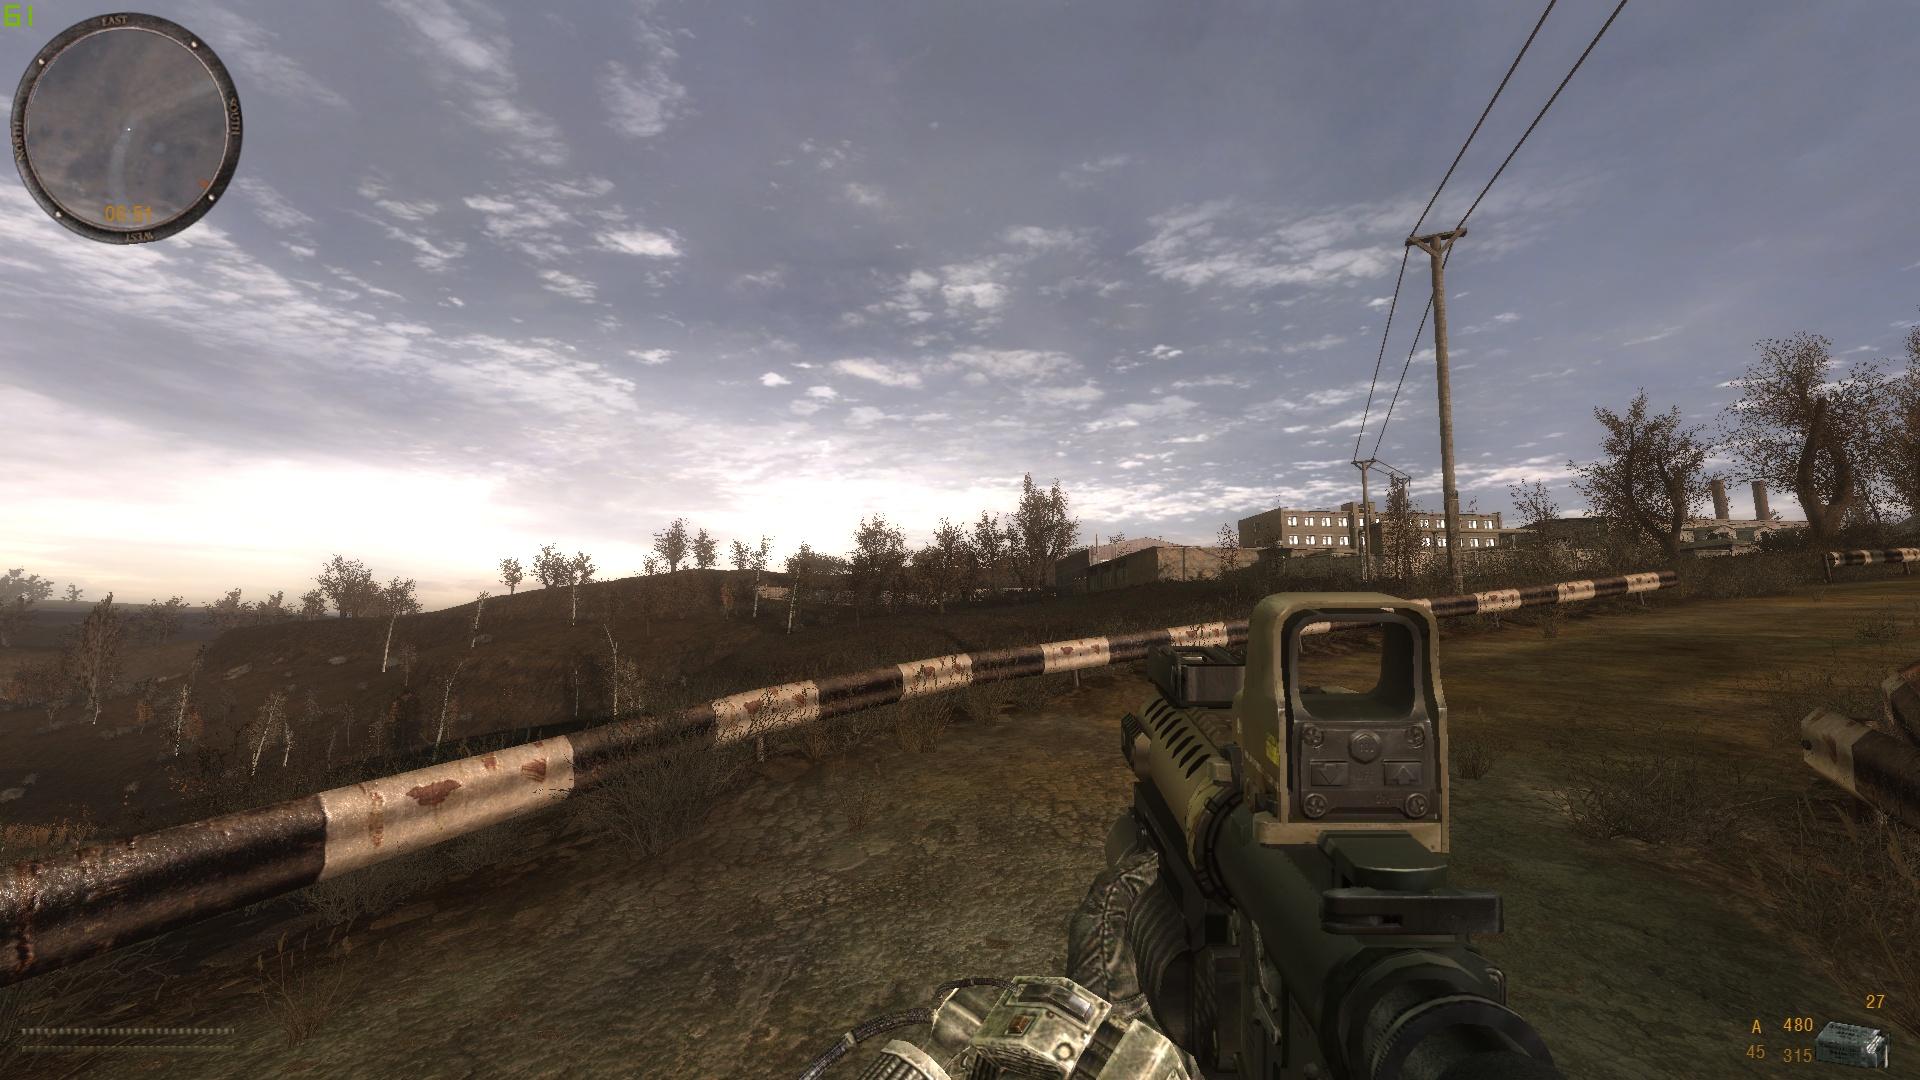 ss_Администратор_05-12-18_11-59-35_(zaton).jpg - S.T.A.L.K.E.R.: Call of Pripyat